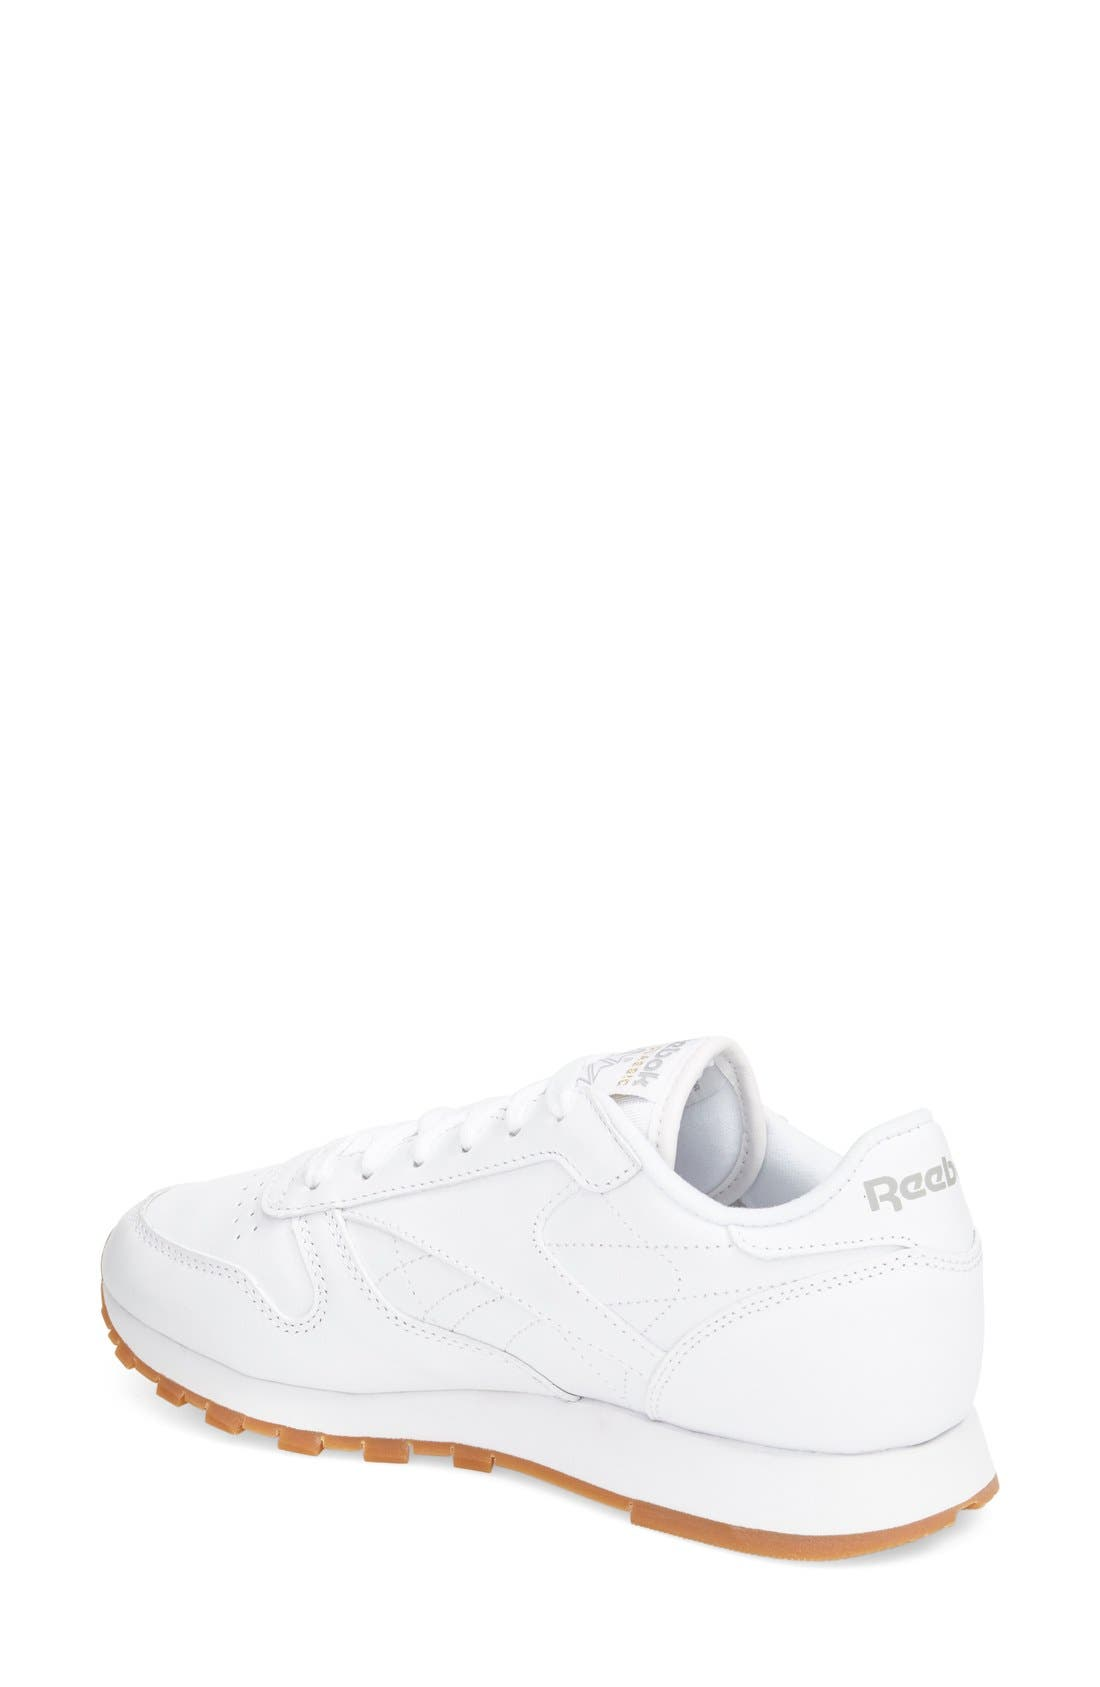 REEBOK, Classic Leather Sneaker, Alternate thumbnail 8, color, US-WHITE/ GUM